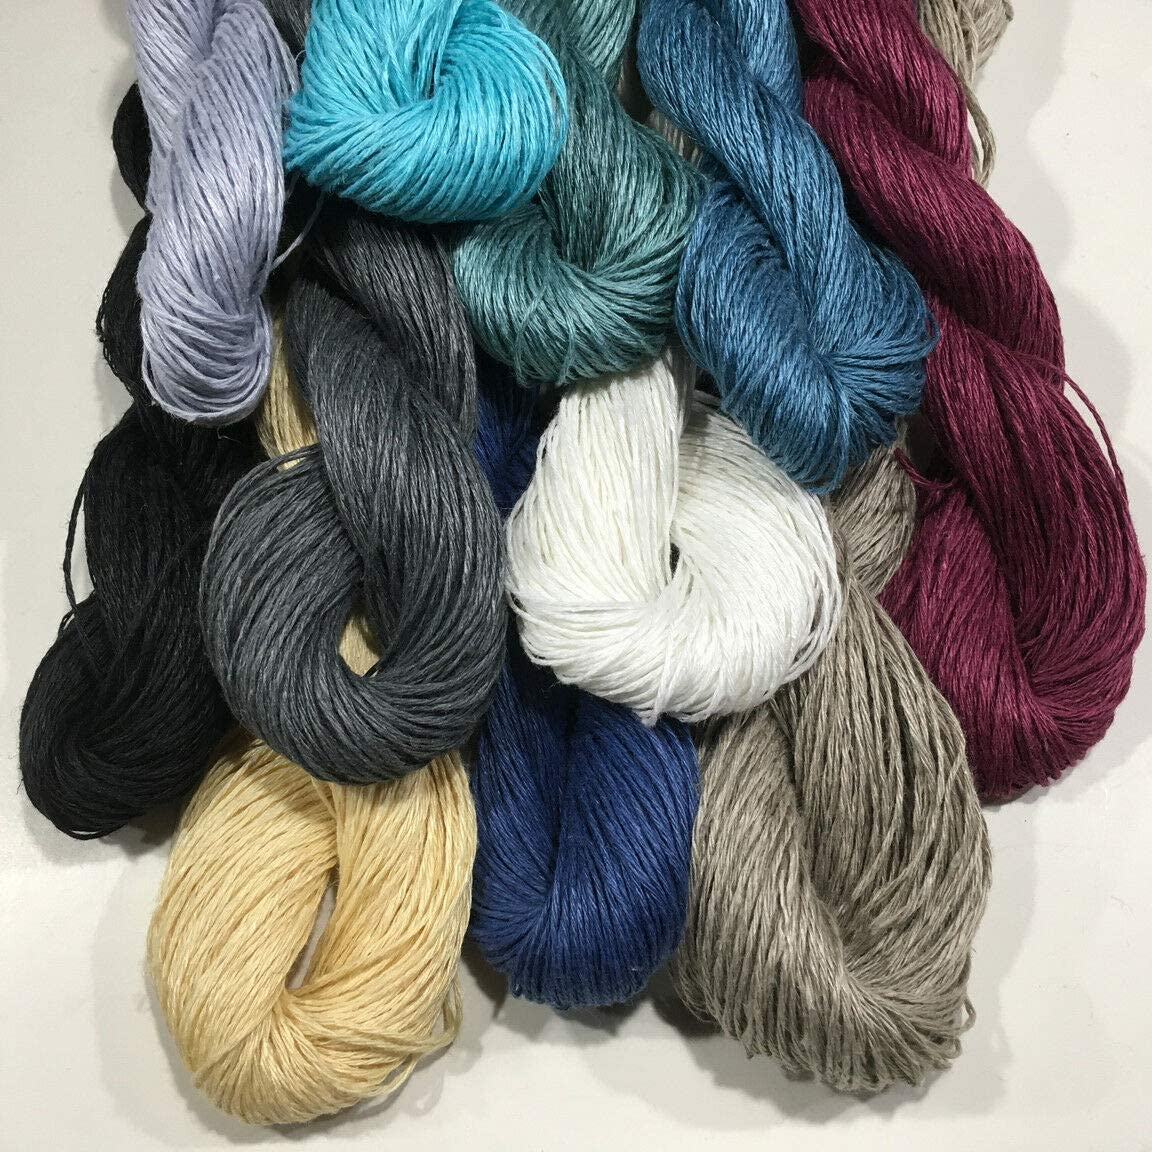 Flax Yarn, DK Weight, 50 Grams, Crochet, Knitting, Weaving. (Black)